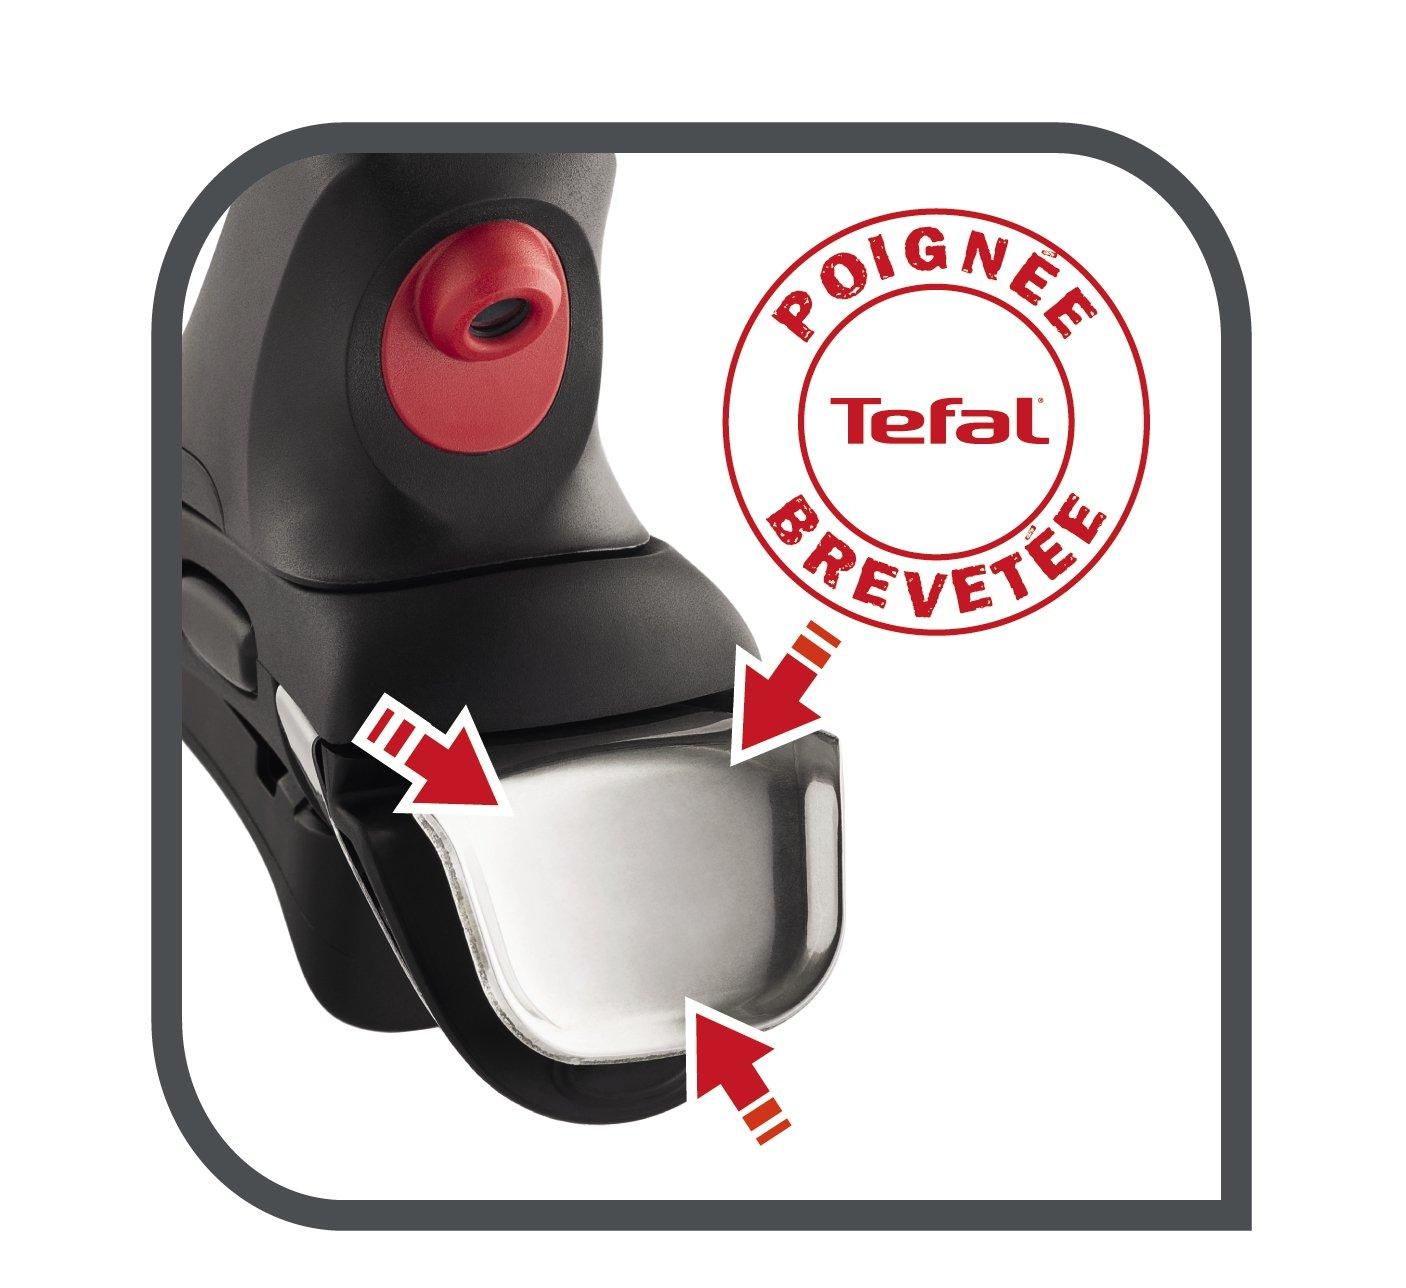 Tefal L9942012 - Mango Inteligente, plástico, Negro, 27.2 x 13.5 x 5 cm: Amazon.es: Hogar